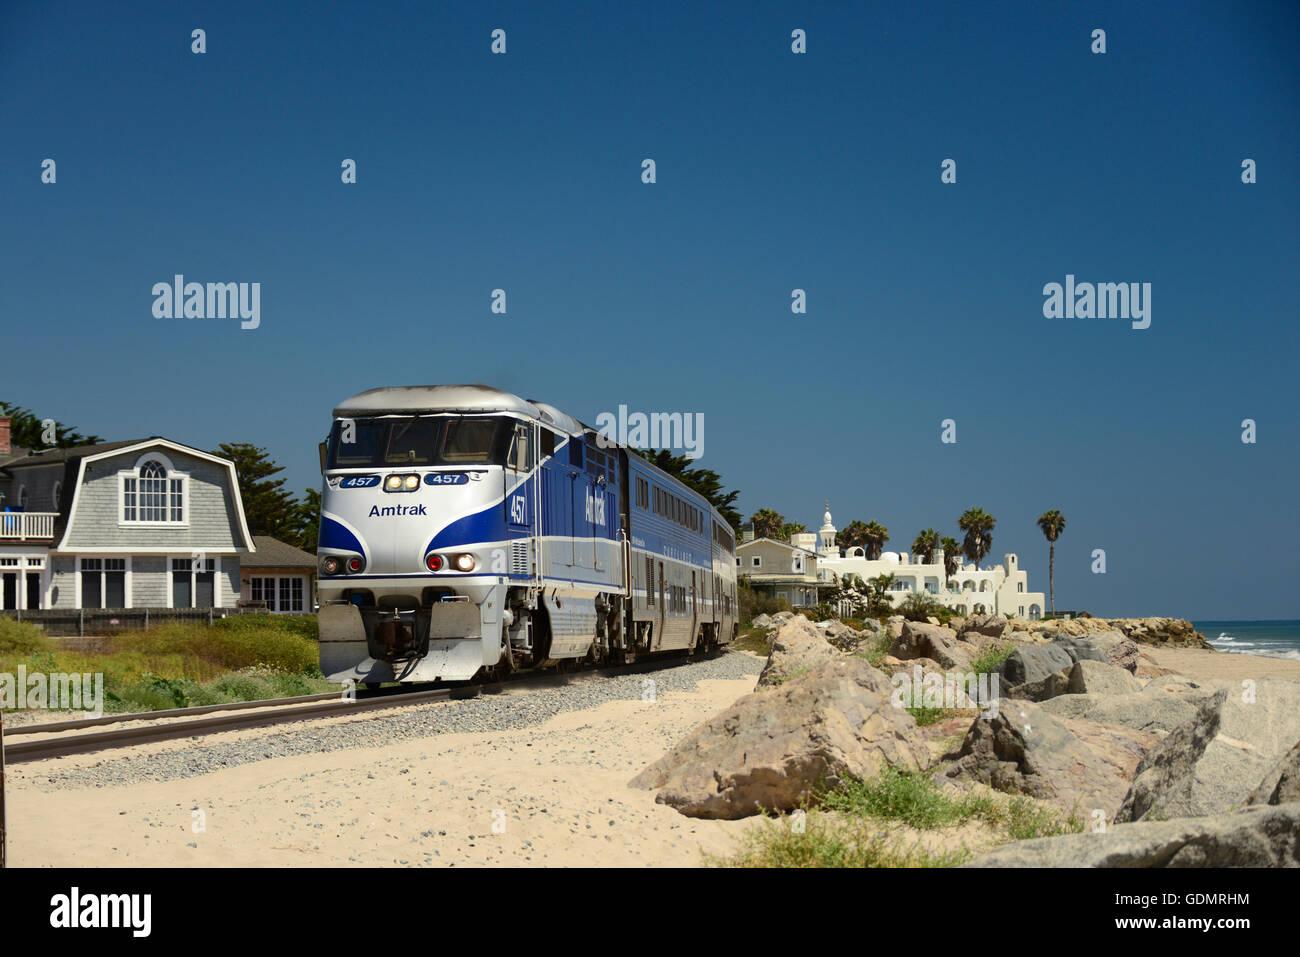 Amtrak Surfrider passenger train on tracks alongside Pacific Ocean beach near Santa Barbara on Central Coast of - Stock Image